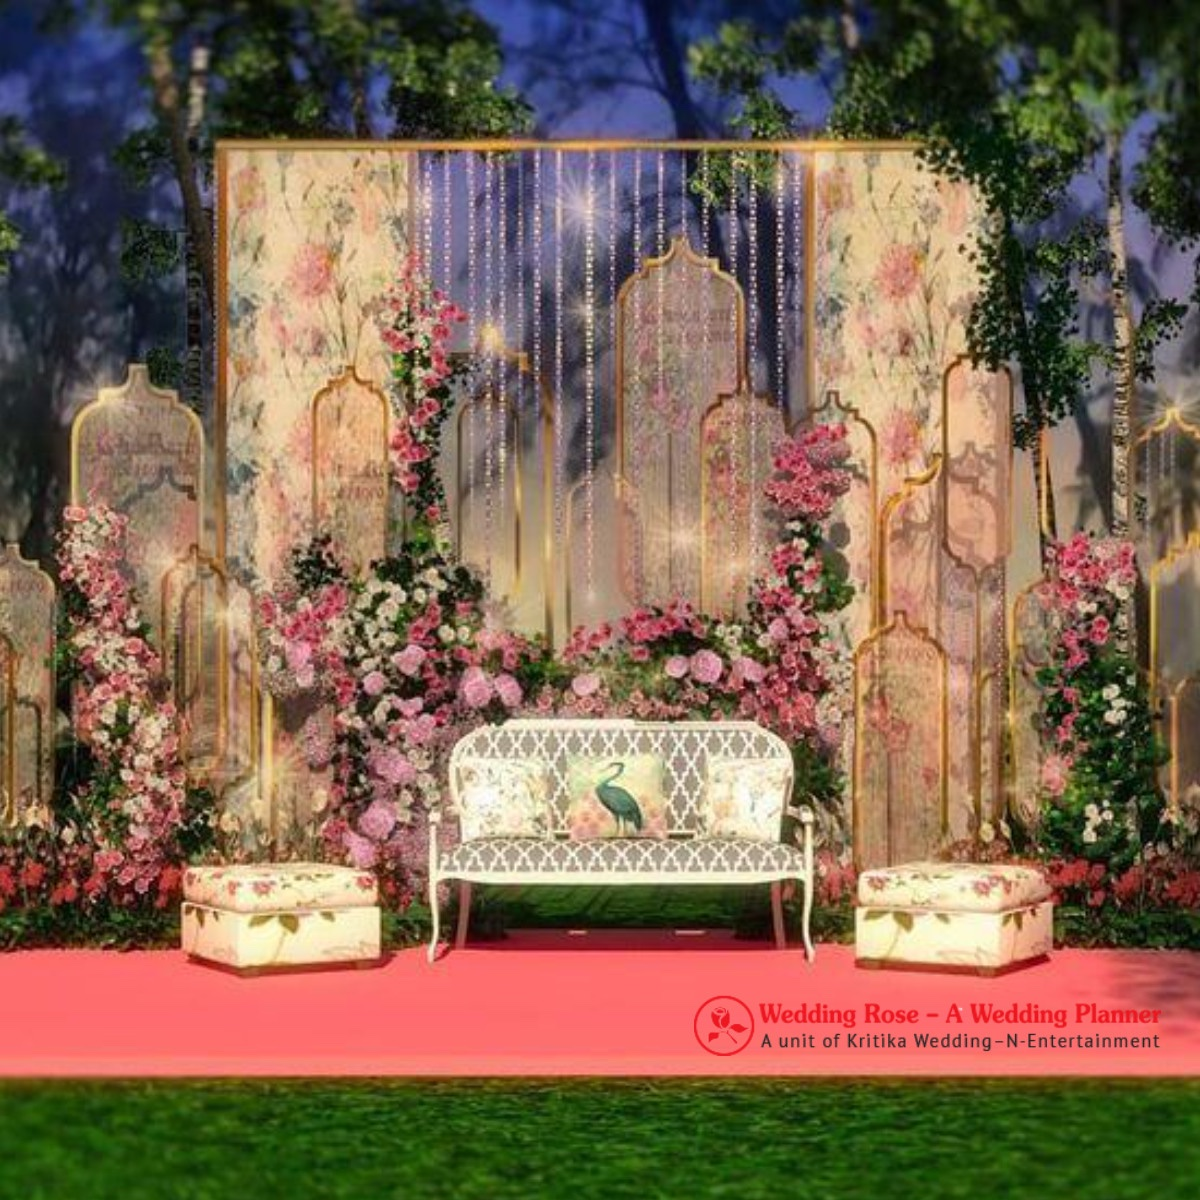 #wedding #weddingday #weddingplanner #eventmanagement #theweddingrose #eventplanner #decoration #weddingideas